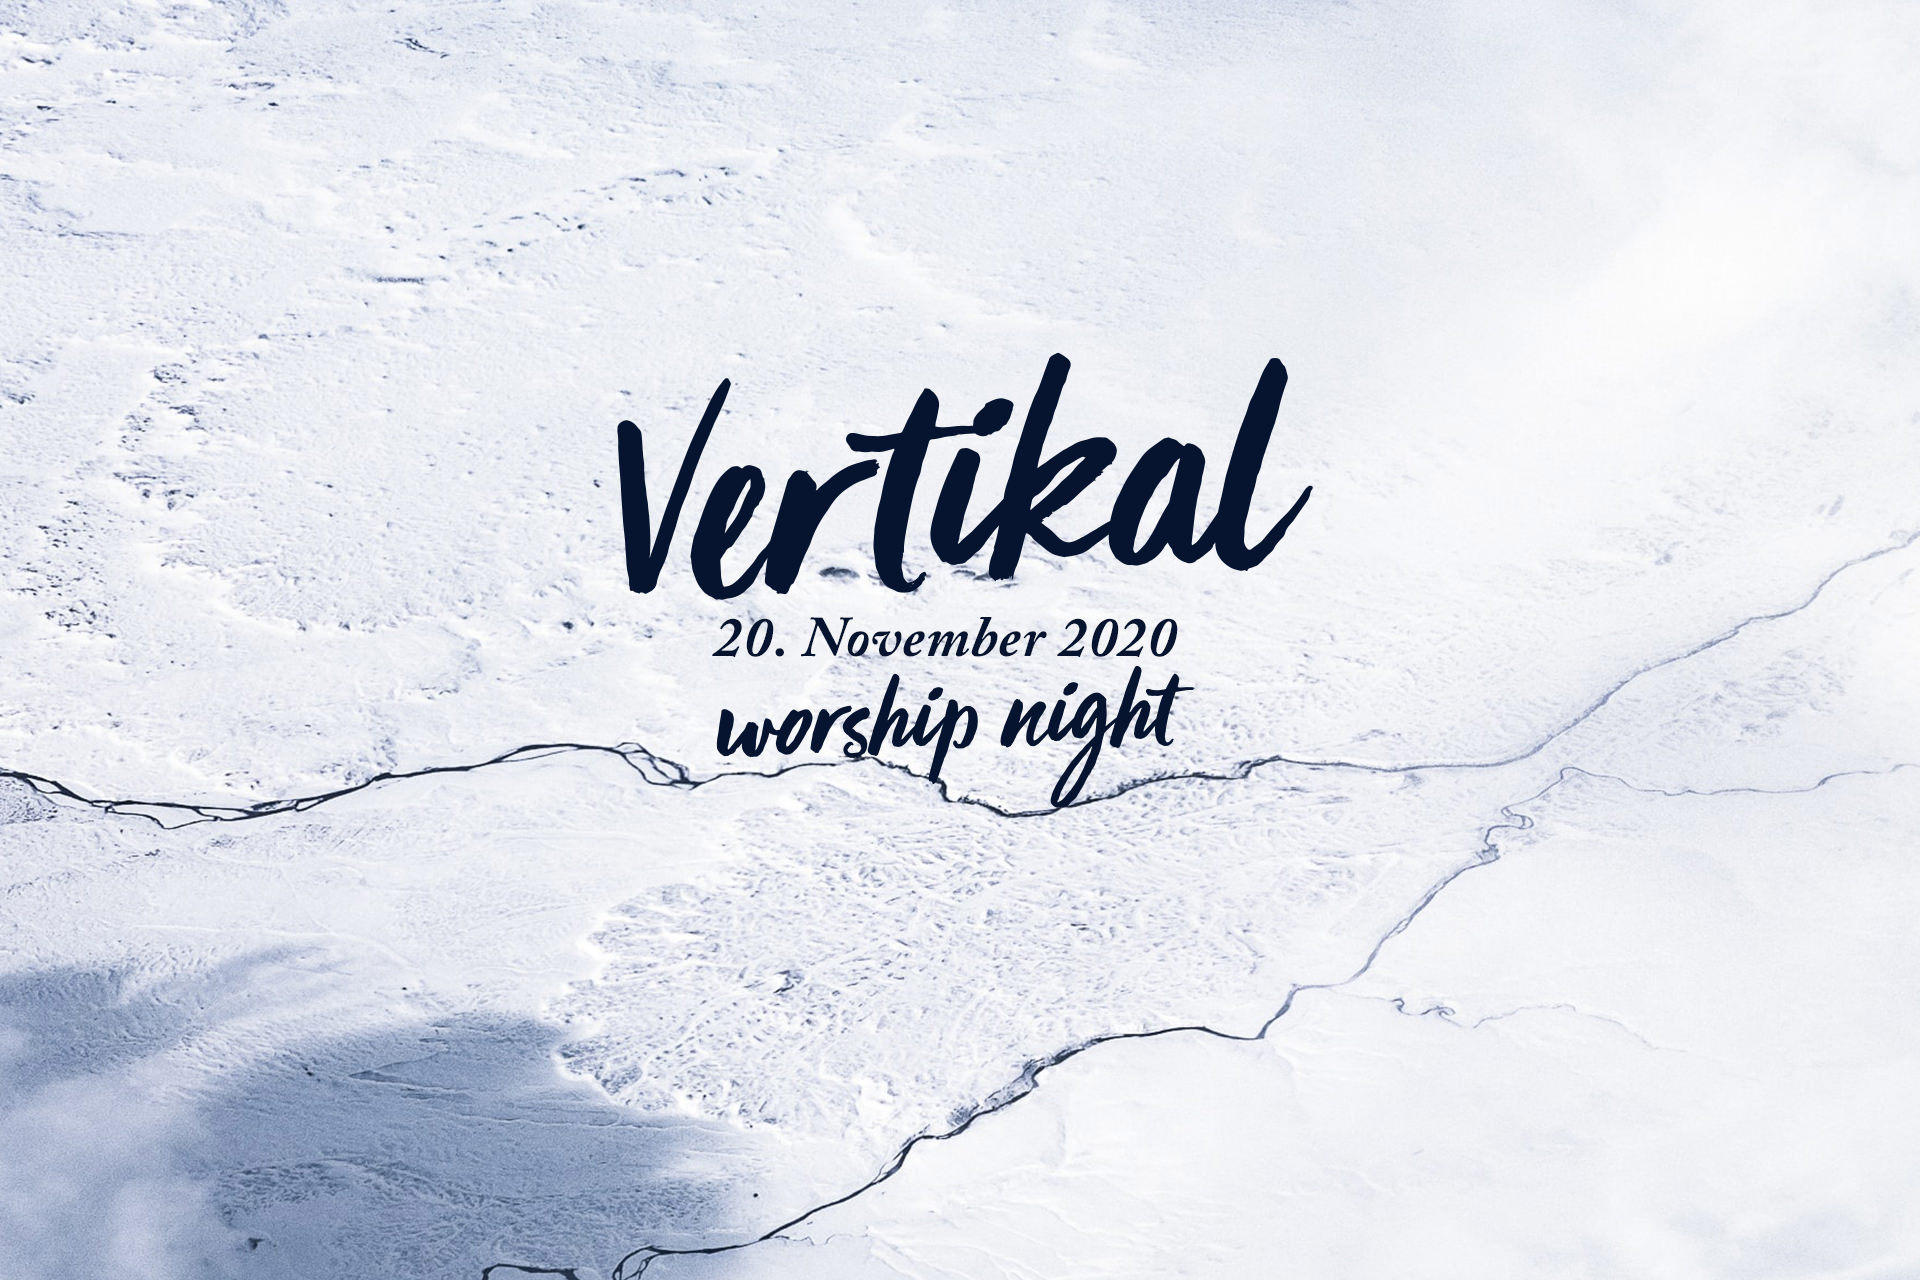 Vertikal Worship Night Bremen